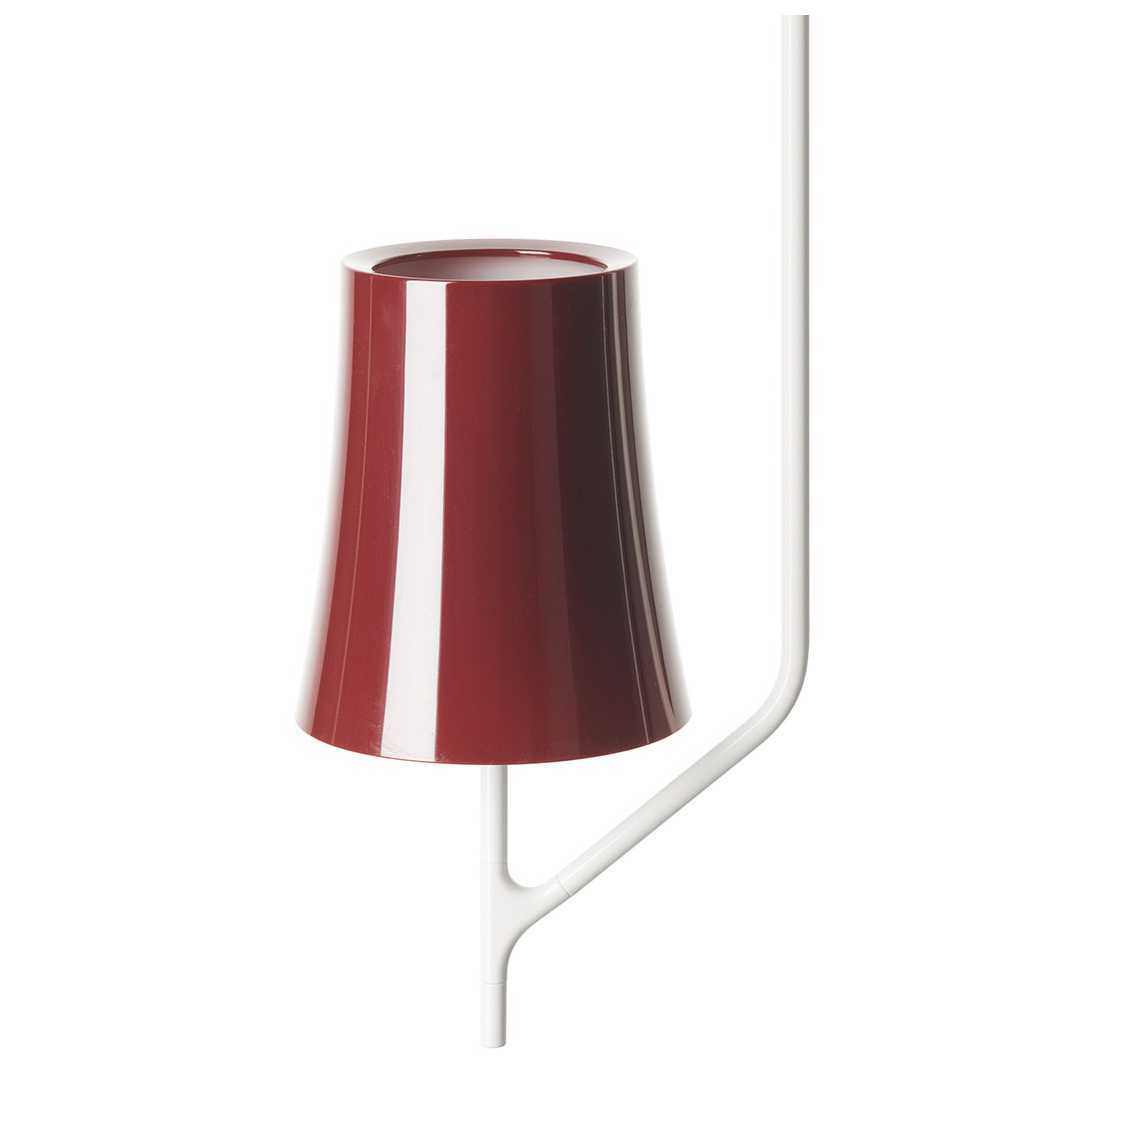 Foscarini Birdie plafondlamp -Rood-Birdie 9